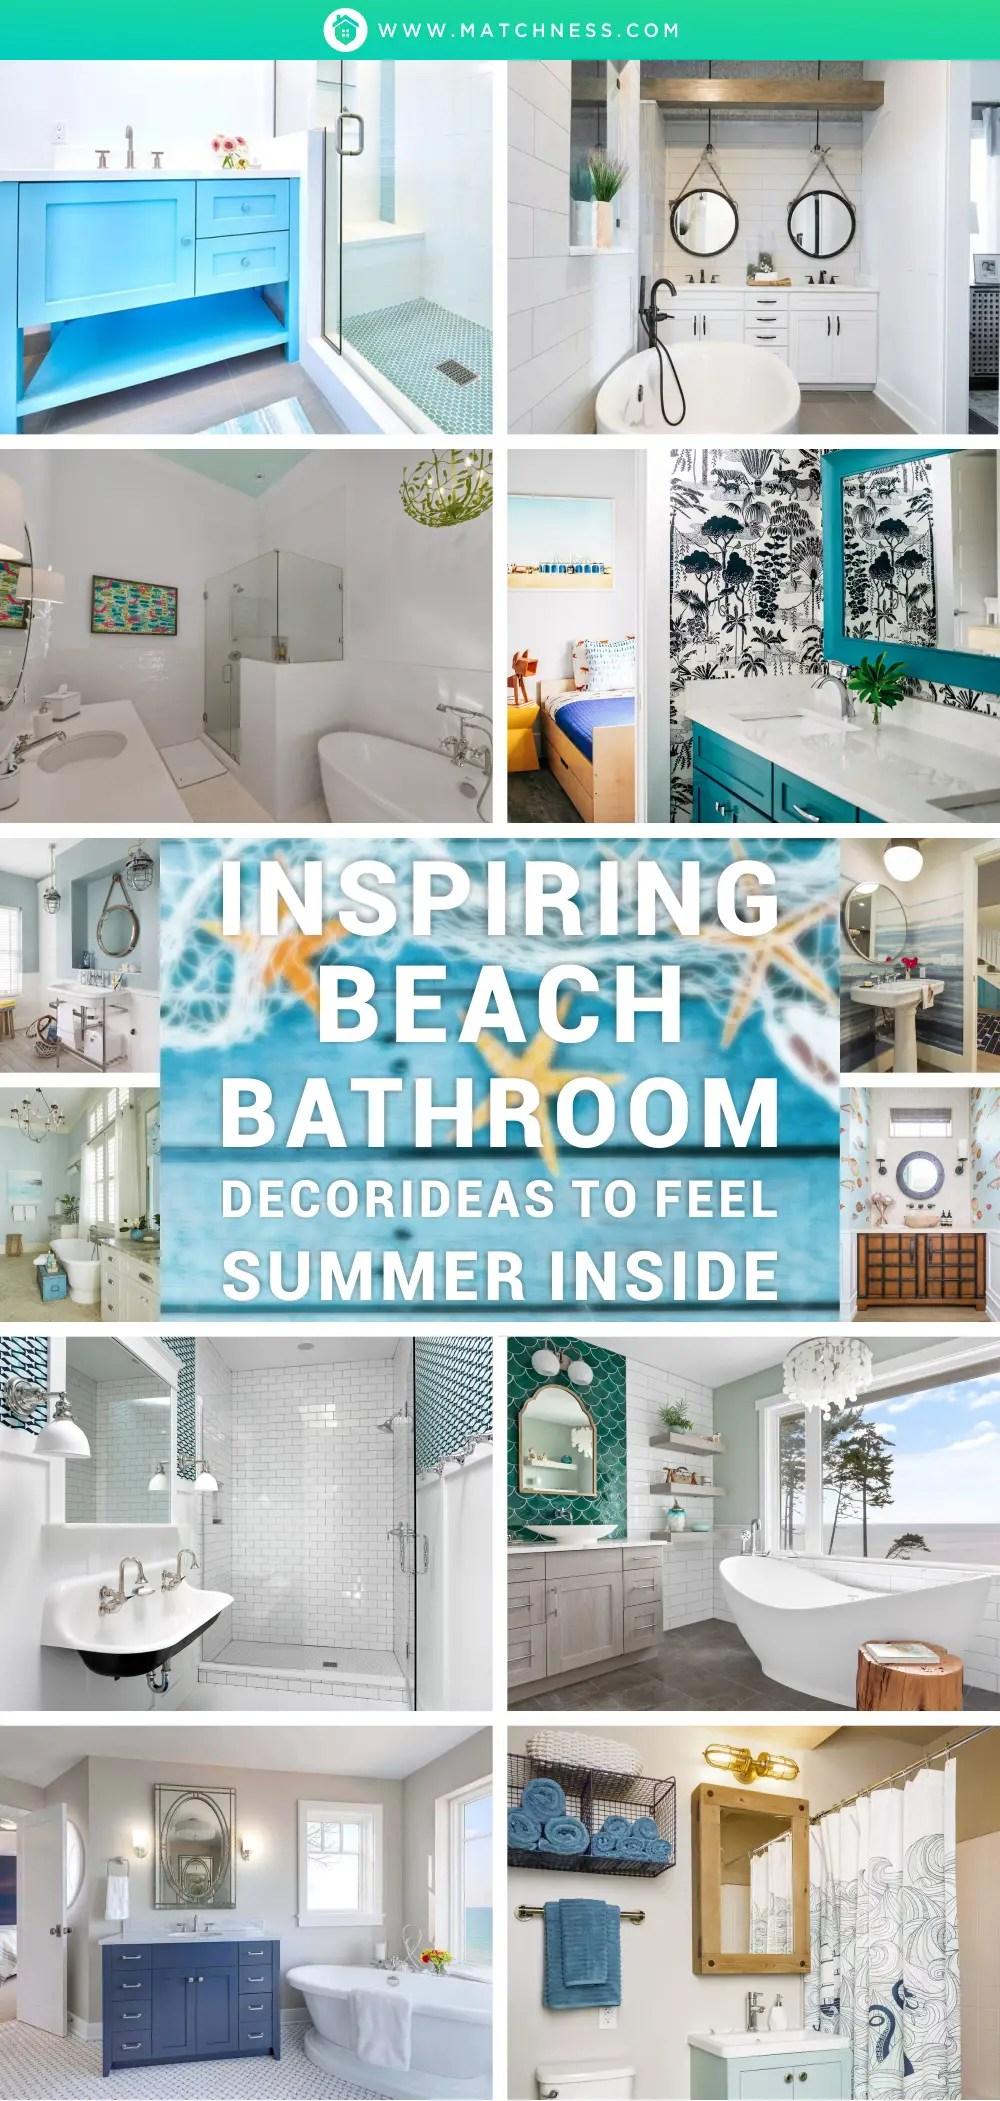 Inspiring-beach-bathroom-decor-ideas-to-feel-summer-inside-1